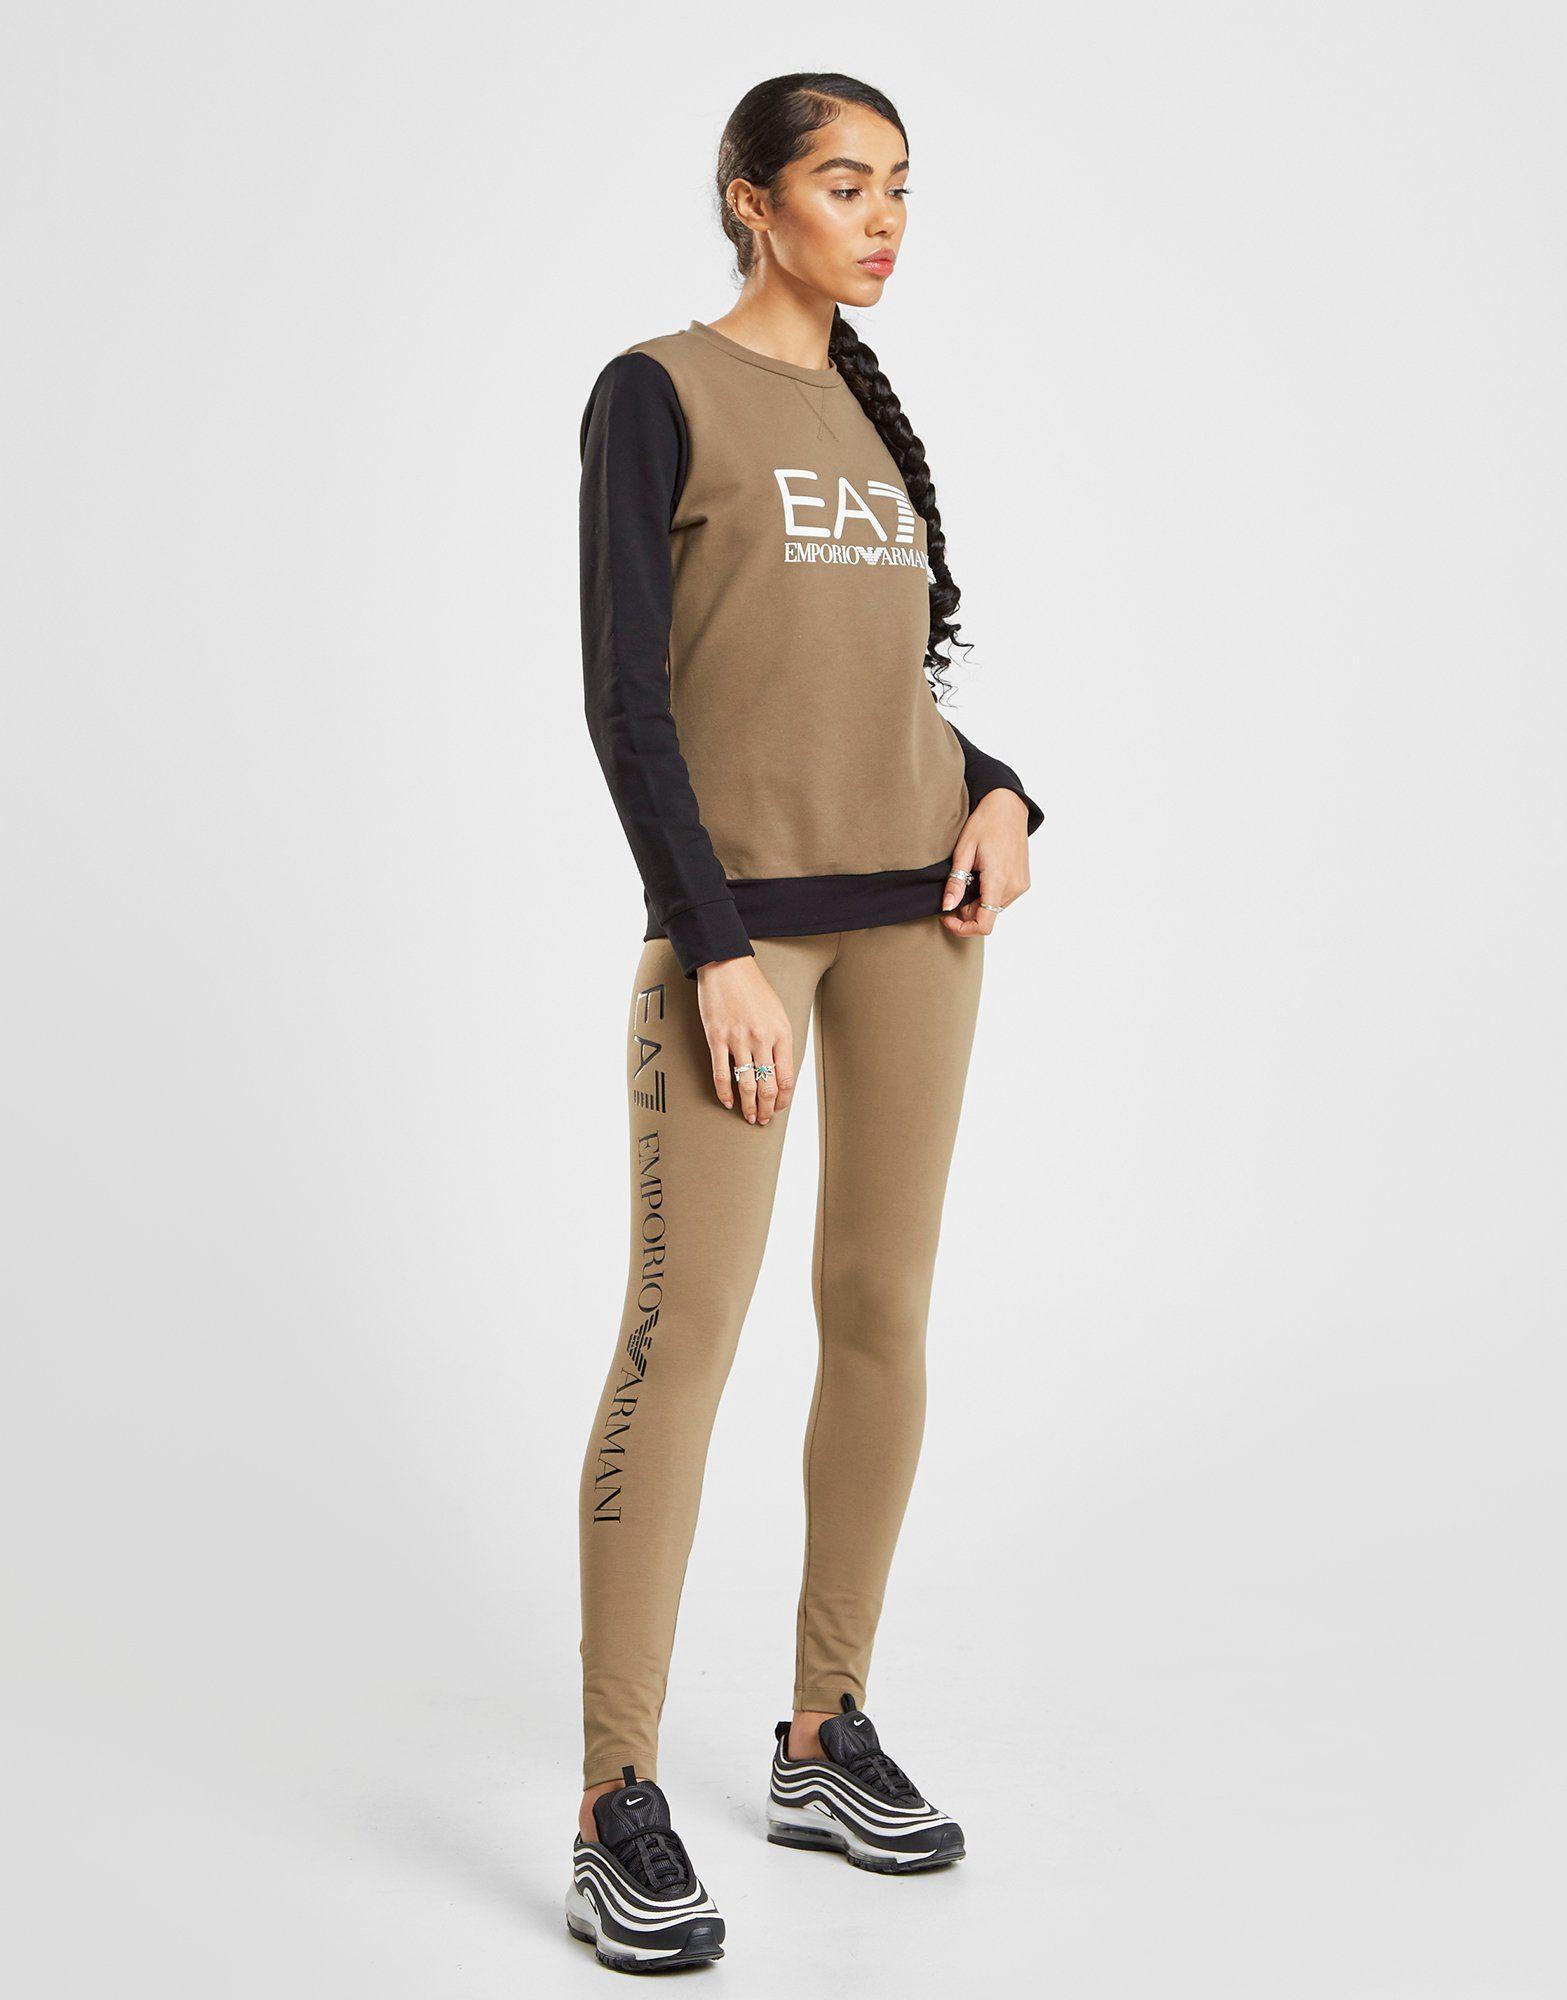 Emporio Armani EA7 Raglan Crew Sweatshirt